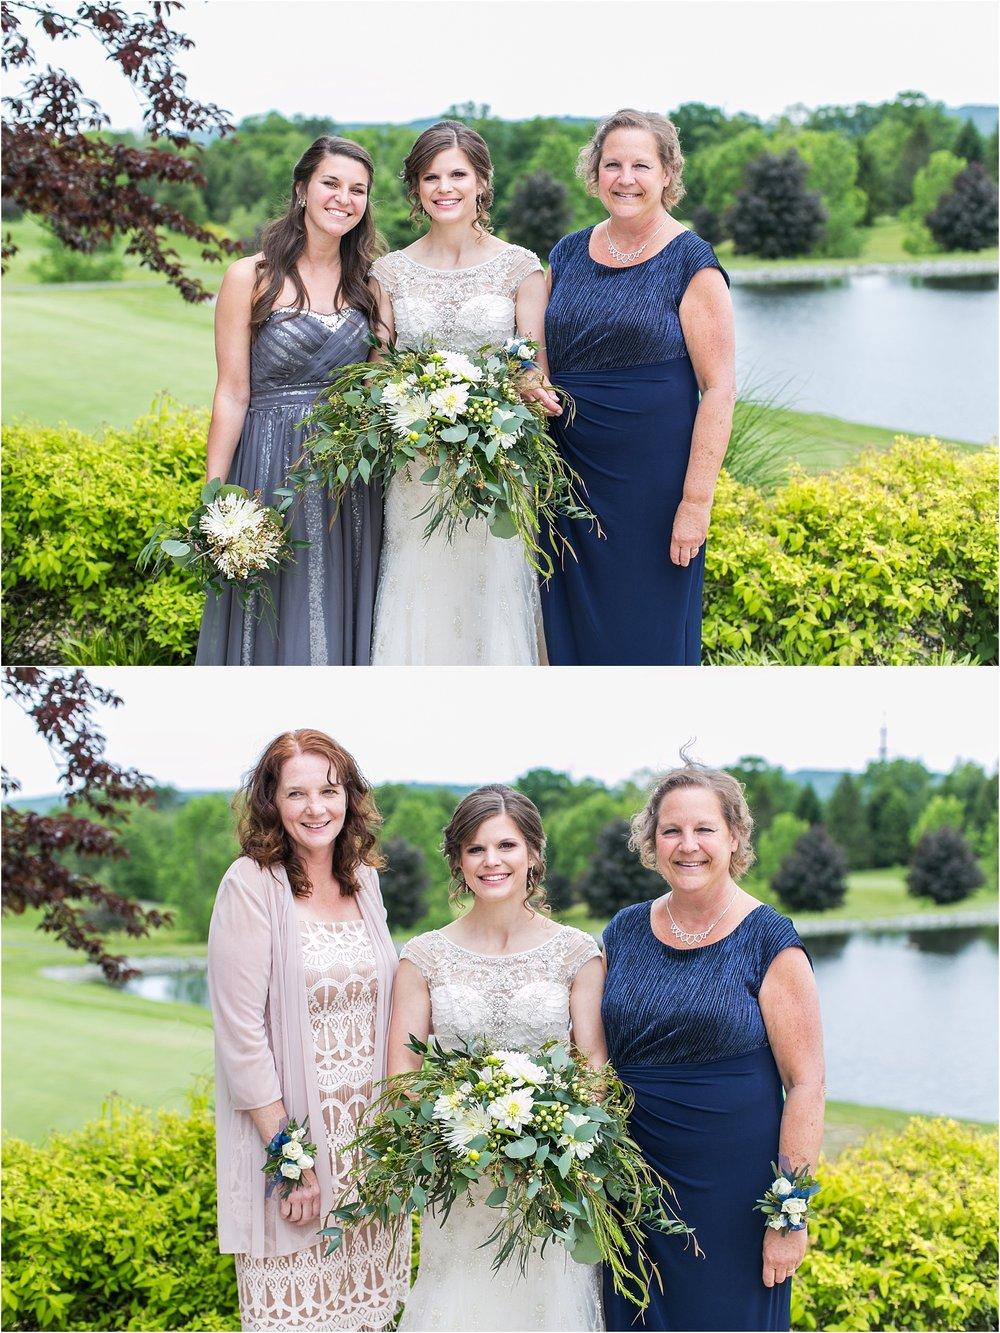 Smith Wedding Liberty Forge Golf Course Wedding Living Radiant Photography Photos_0096.jpg